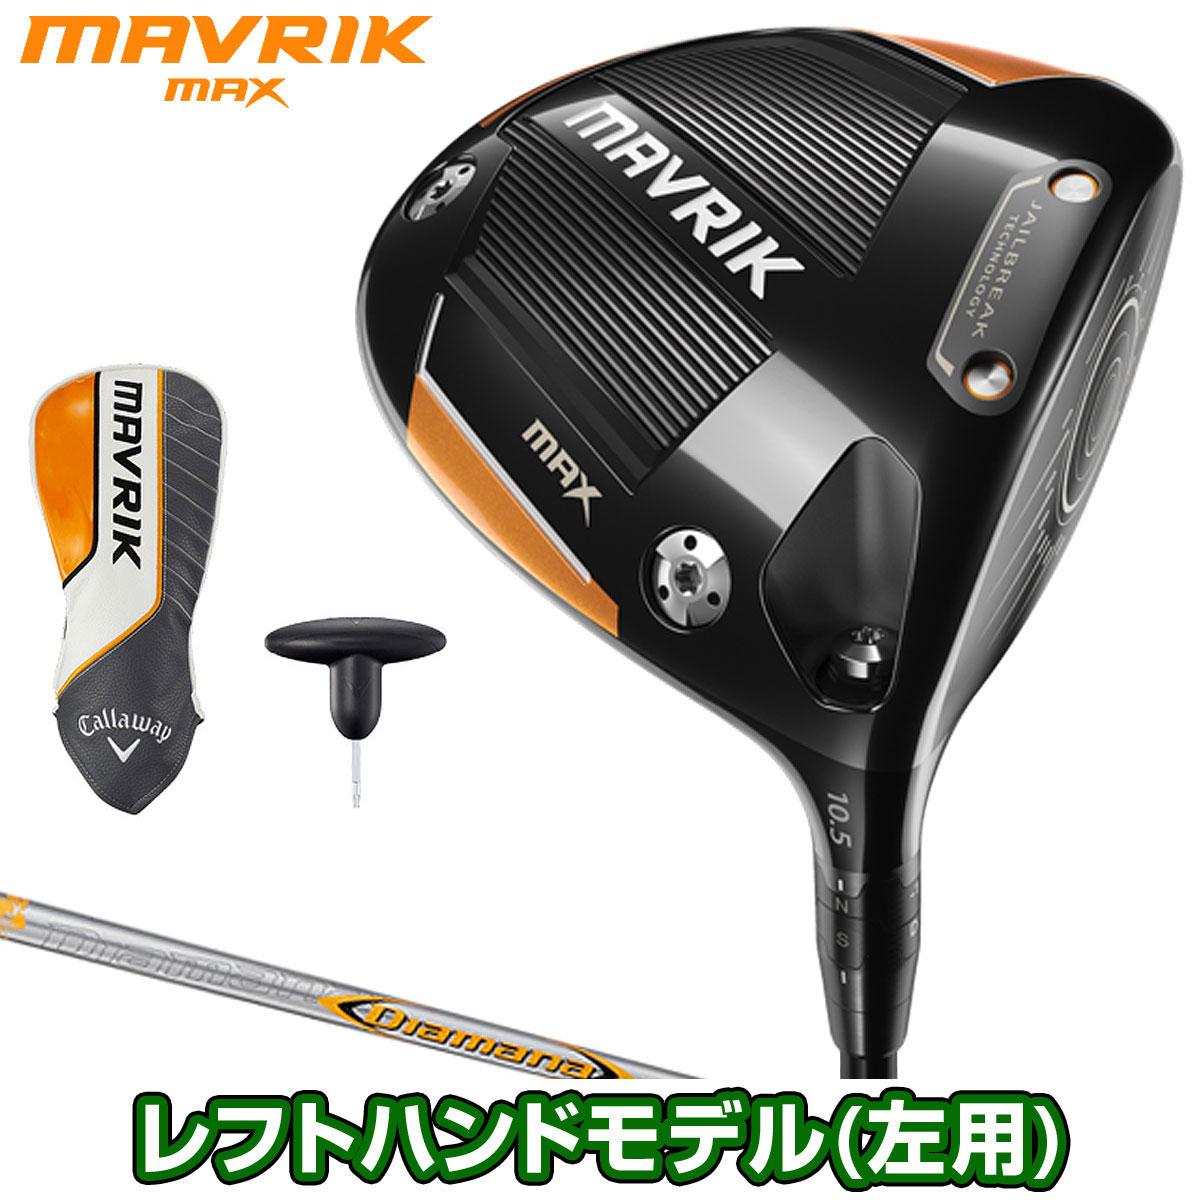 Callaway(キャロウェイ)日本正規品 MAVRIK MAX(マーベリックマックス)ドライバー 2020新製品 Diamana 40 for Callawayカーボンシャフト 「レフトハンドモデル(左用)」 【あす楽対応】